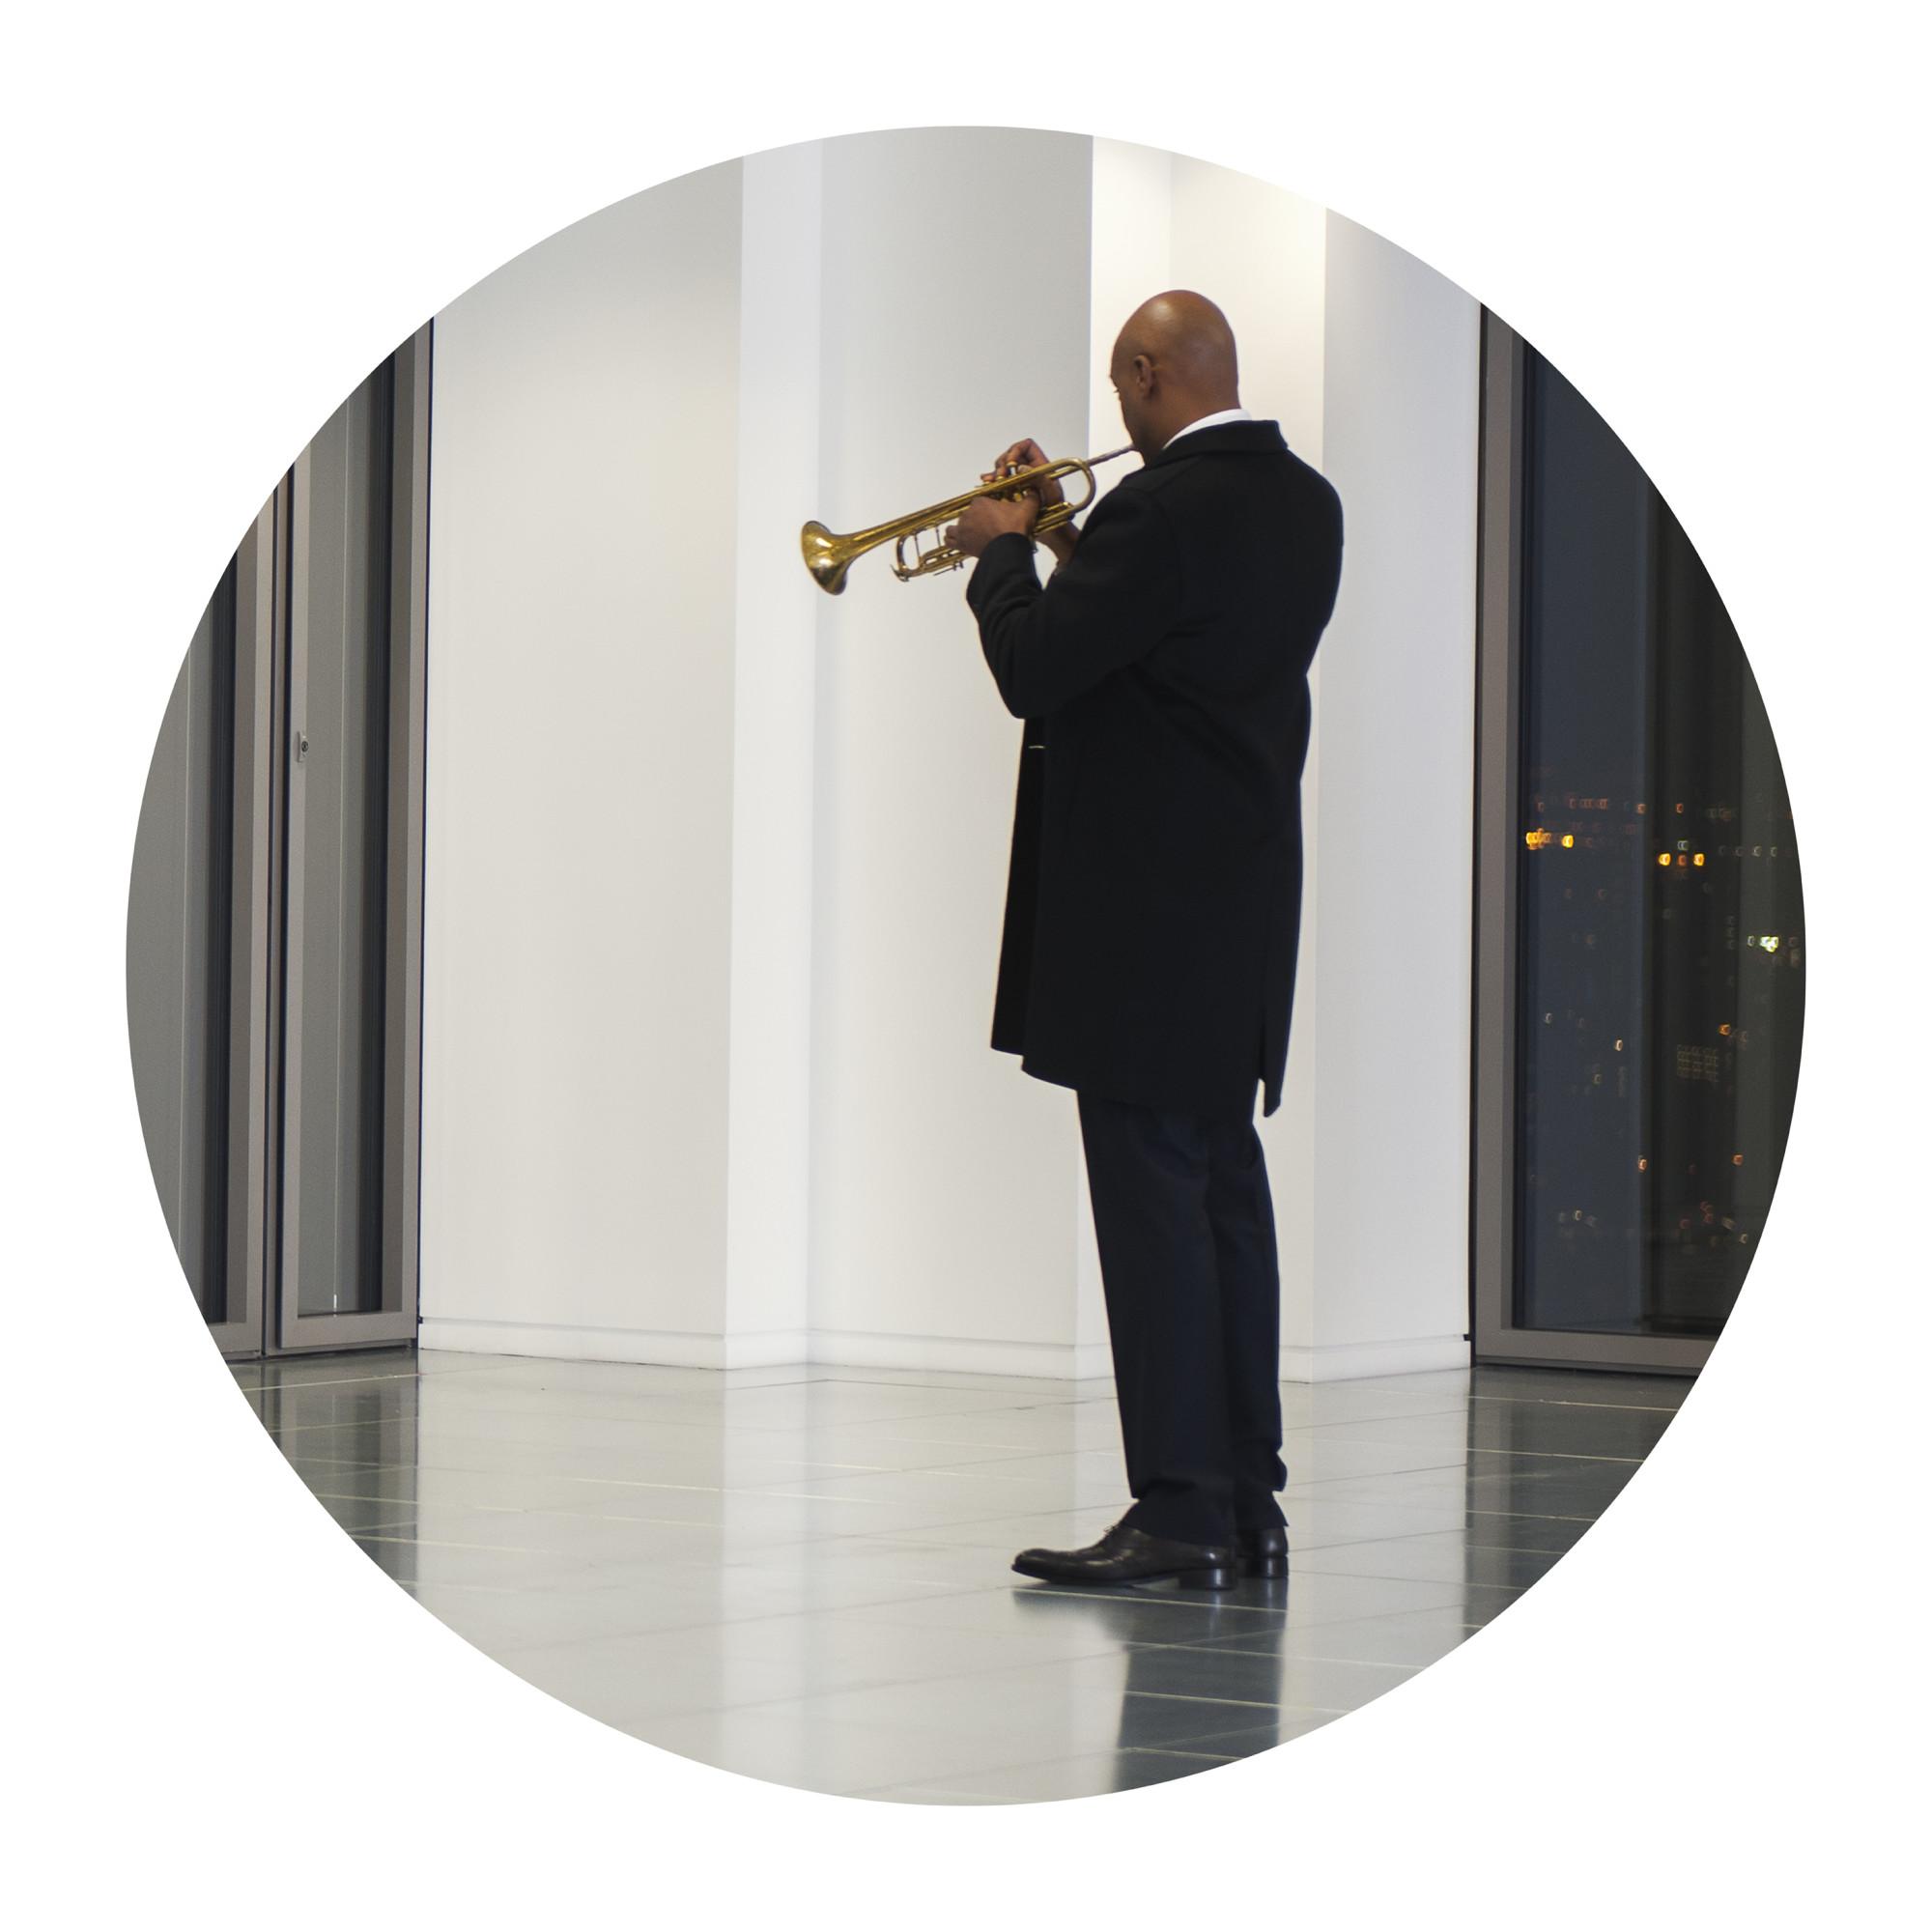 Isaac Julien, BANKER PORTRAIT (Playtime), 2013